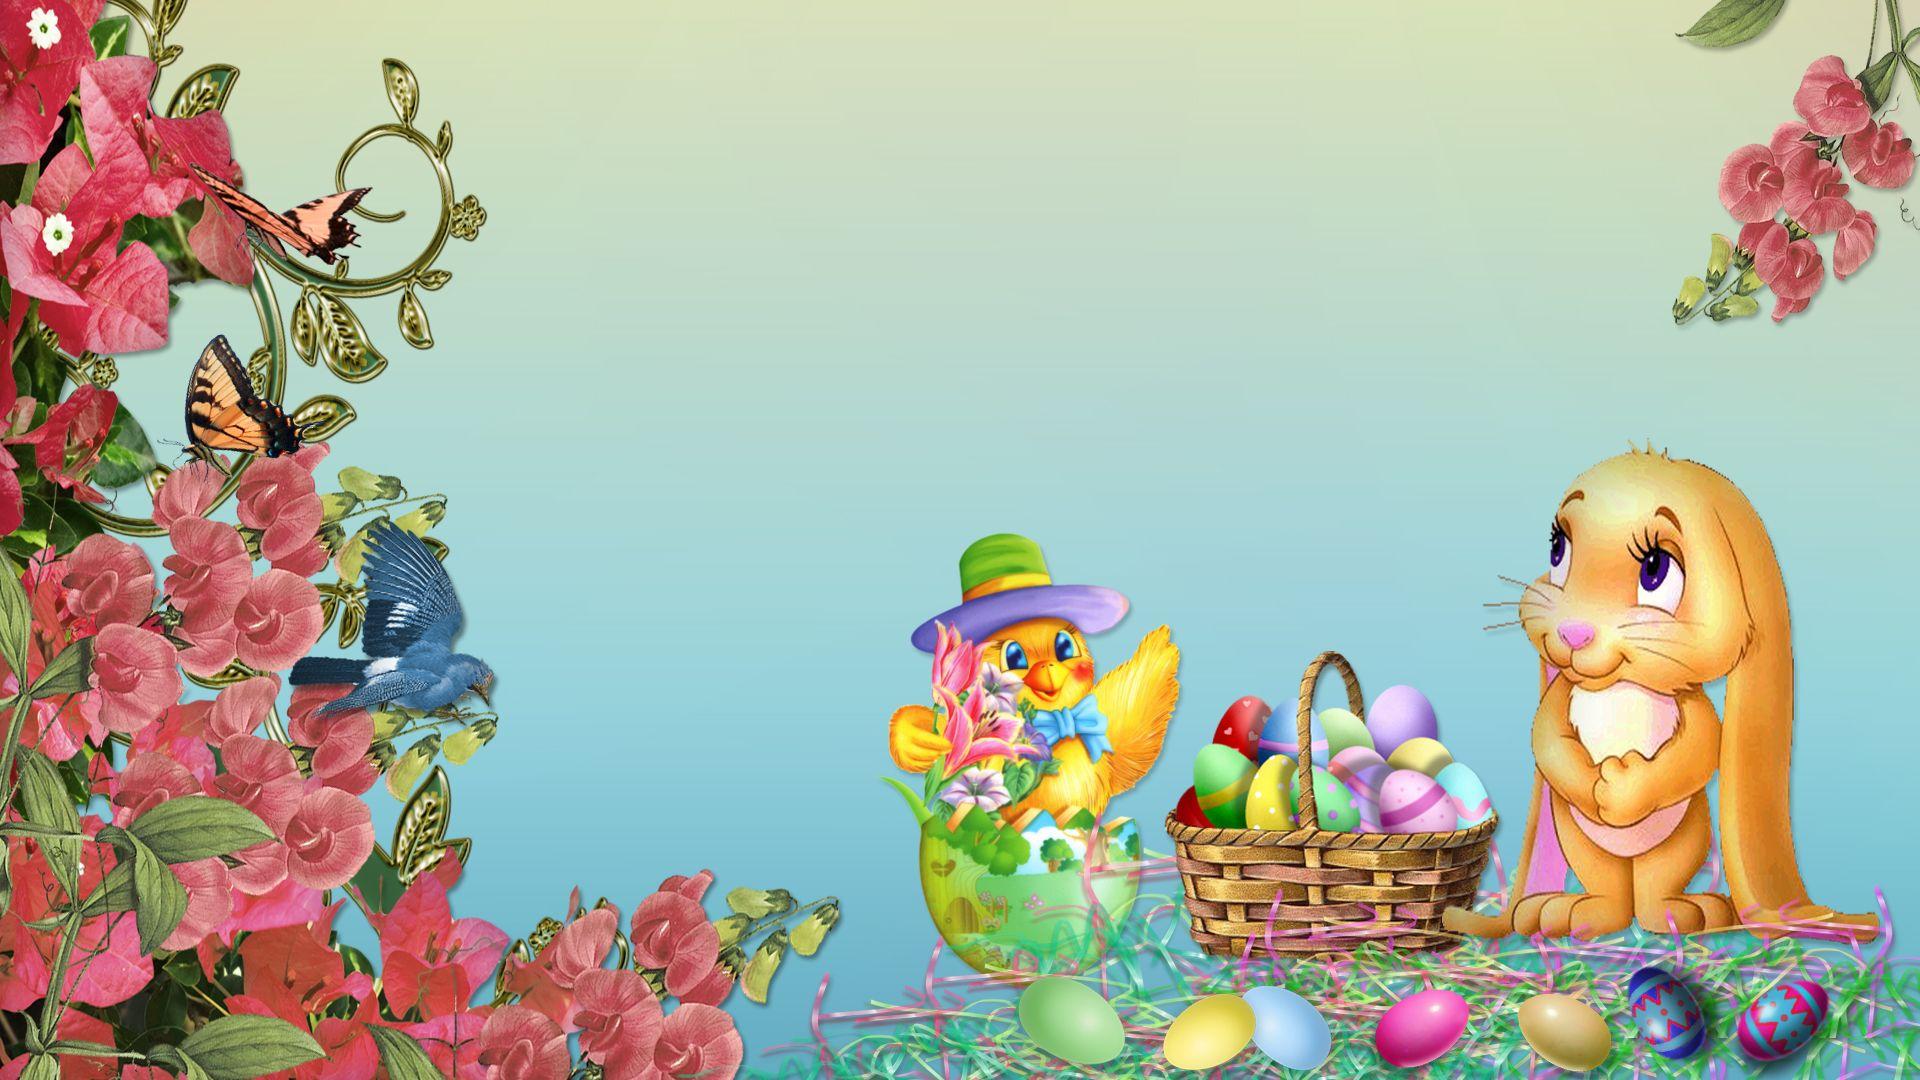 Easter Wallpapers For Desktop Easter Computer Wallpapers Easter Wallpaper Easter Backgrounds Happy Easter Wallpaper